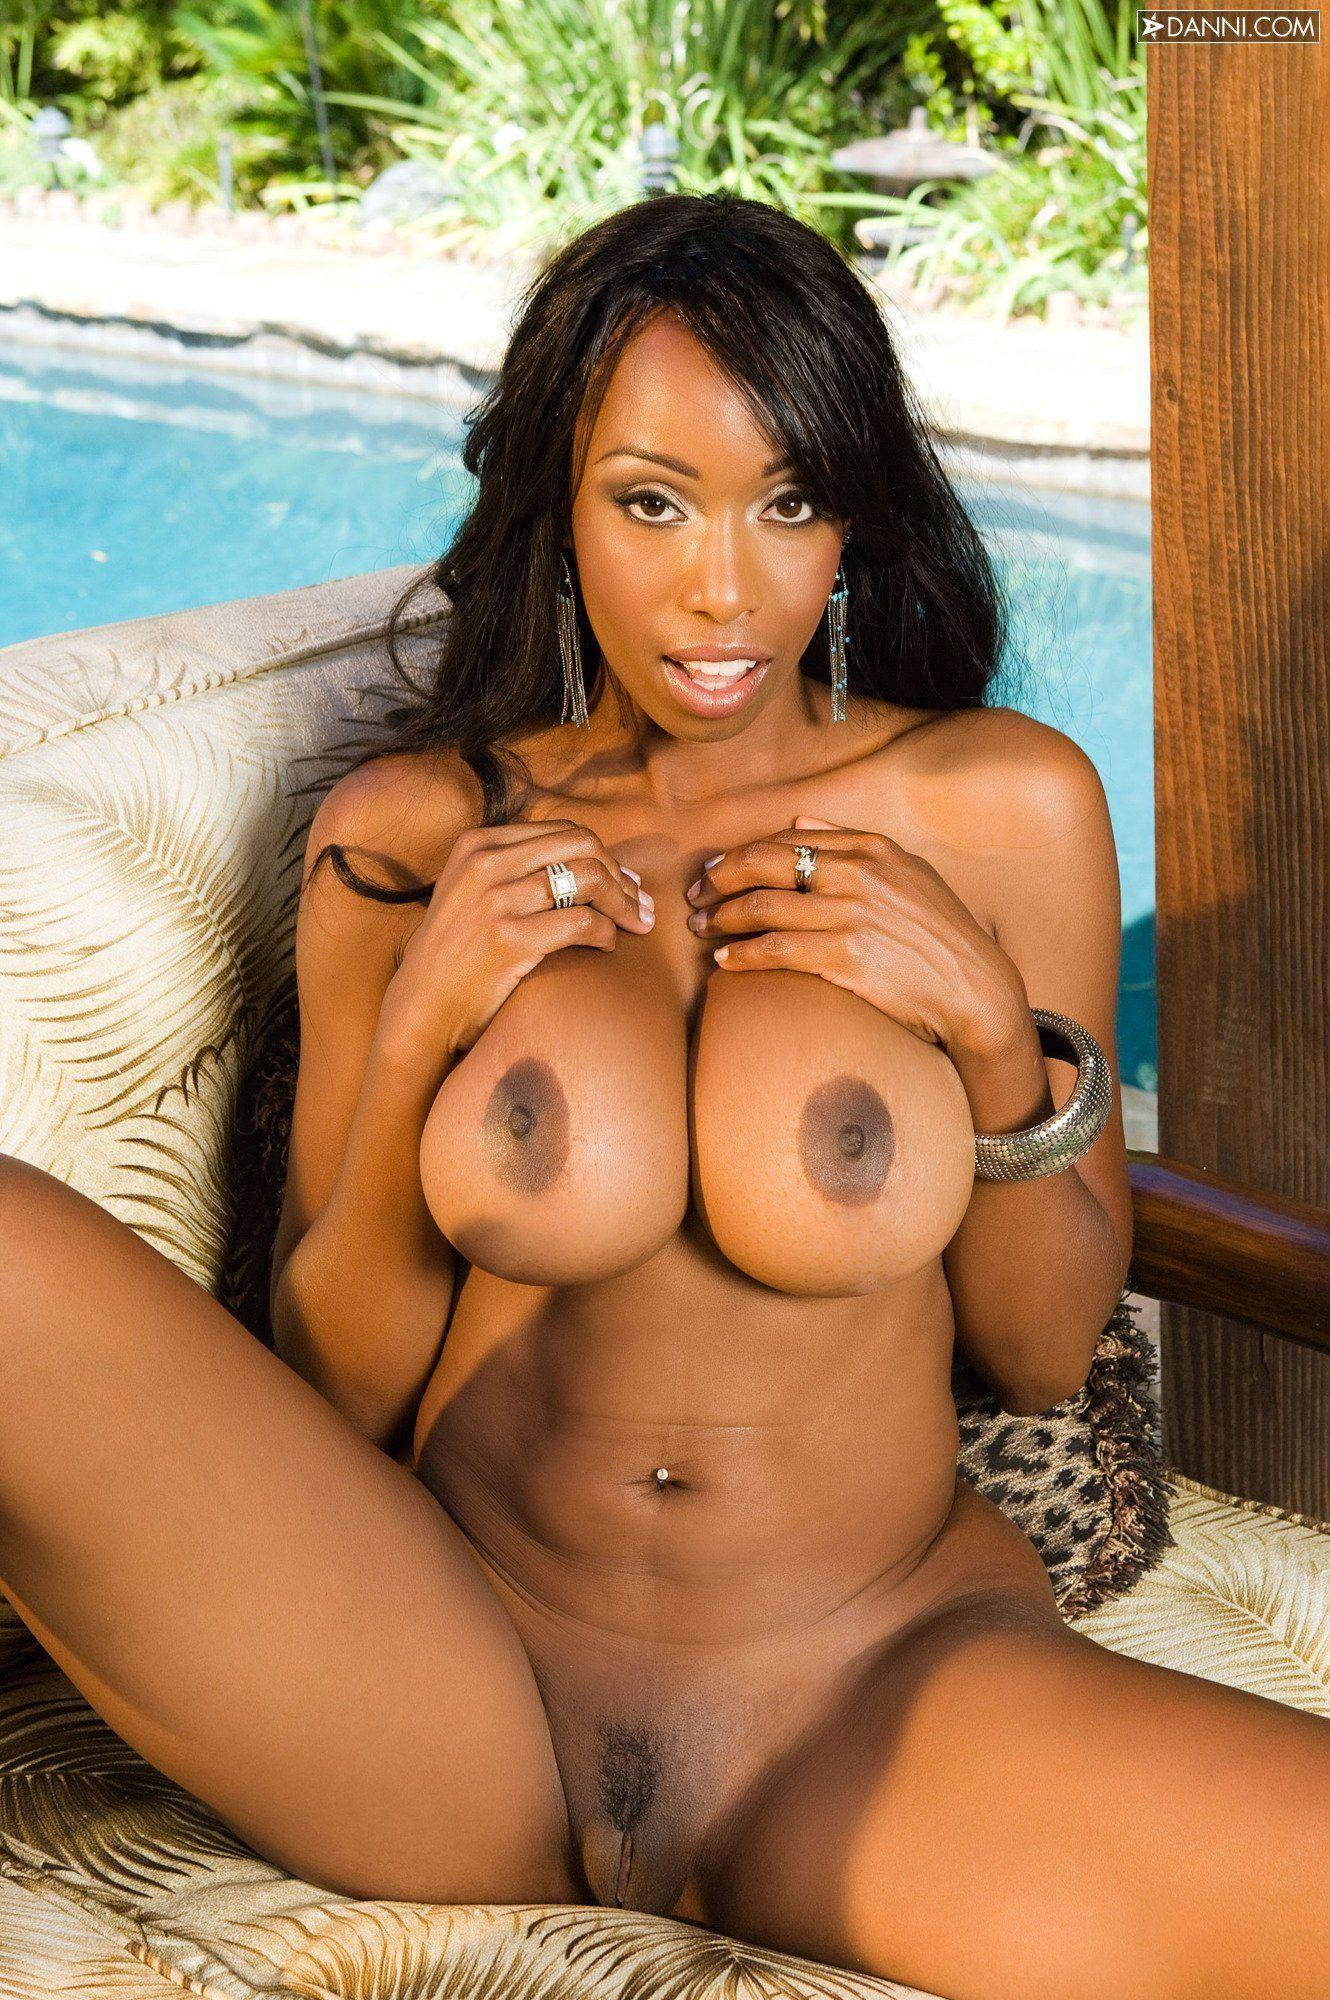 Black women nude image